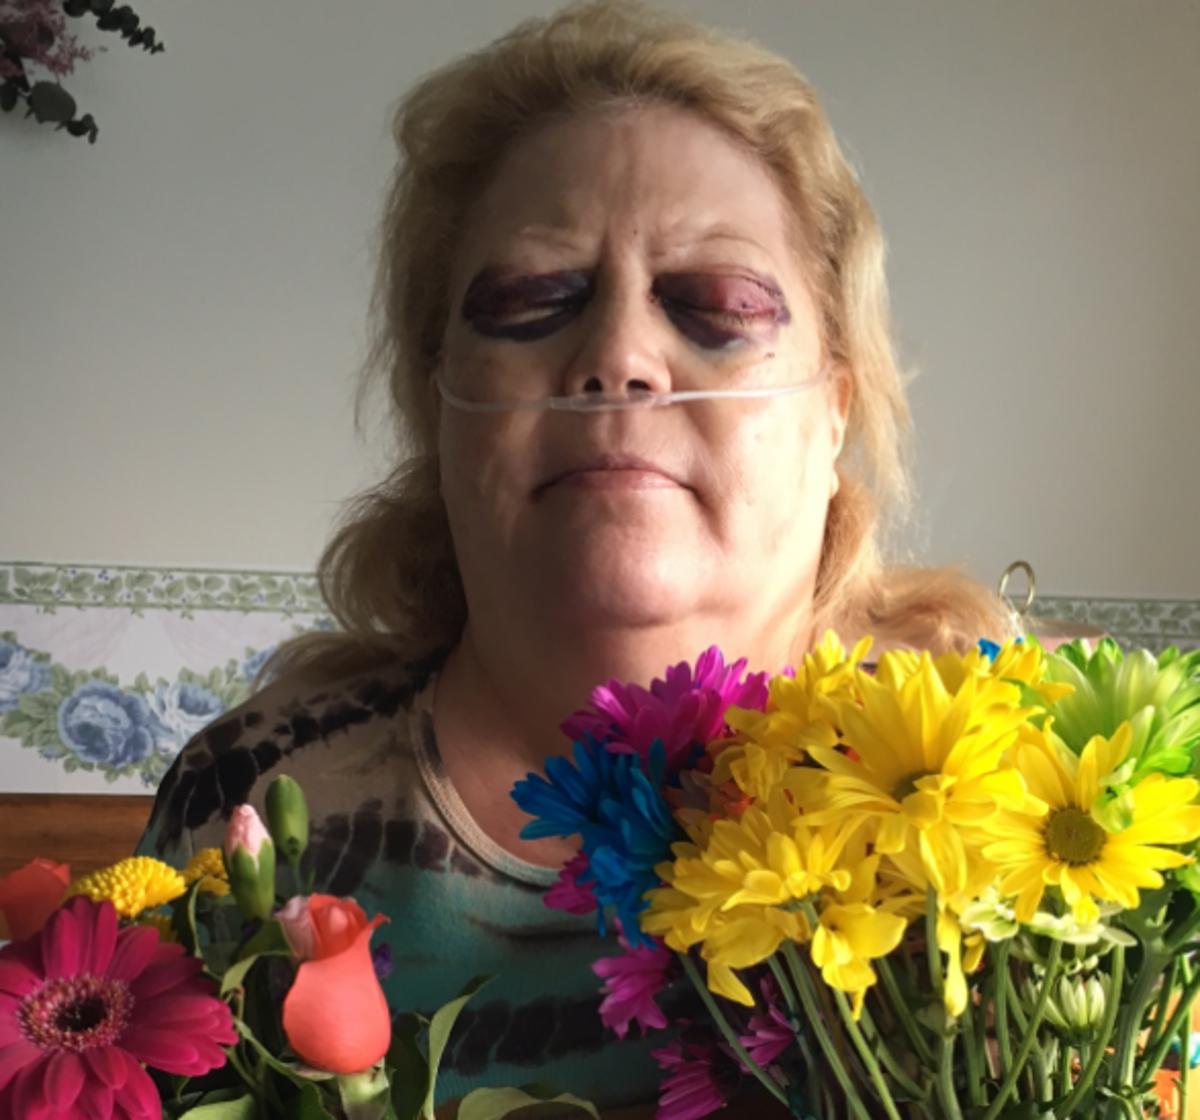 My Orbital Decompression Surgery Nightmare